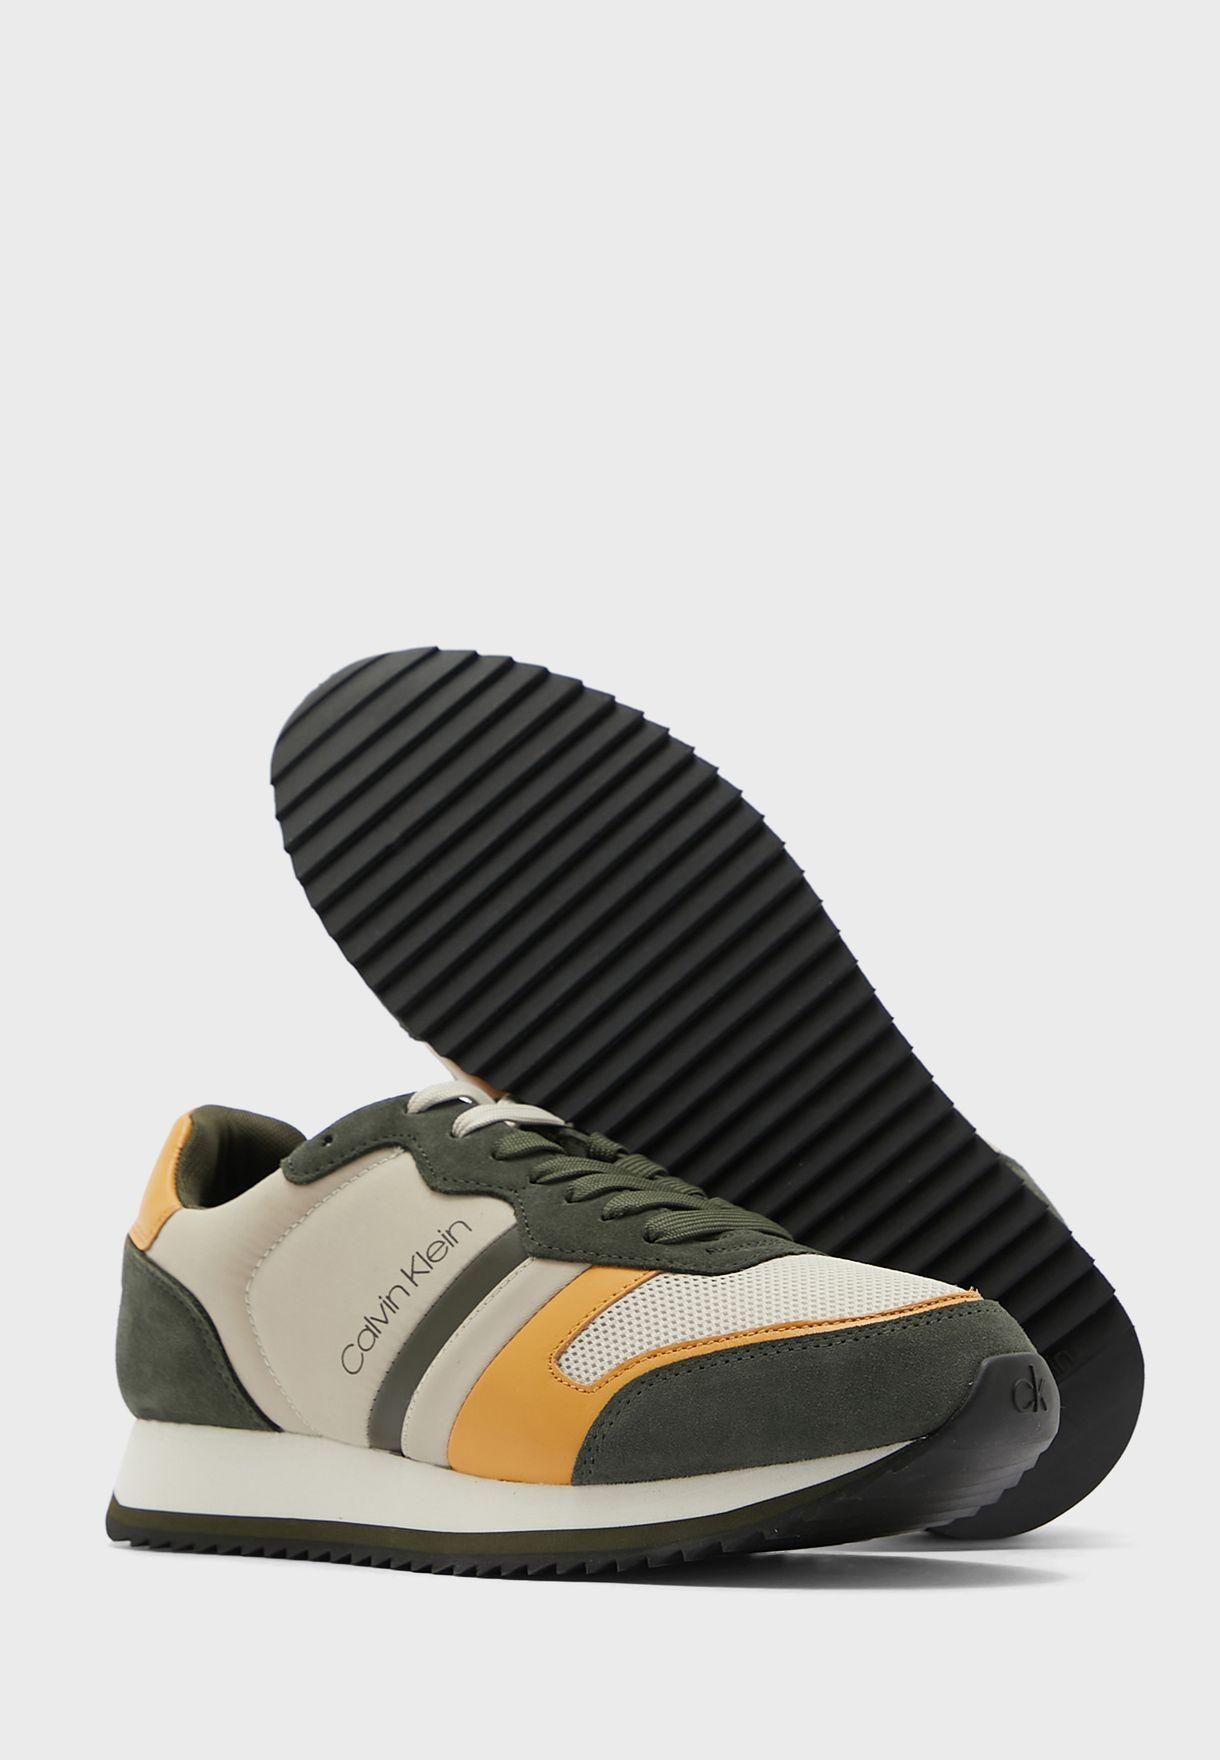 Casual Low Top Sneakers